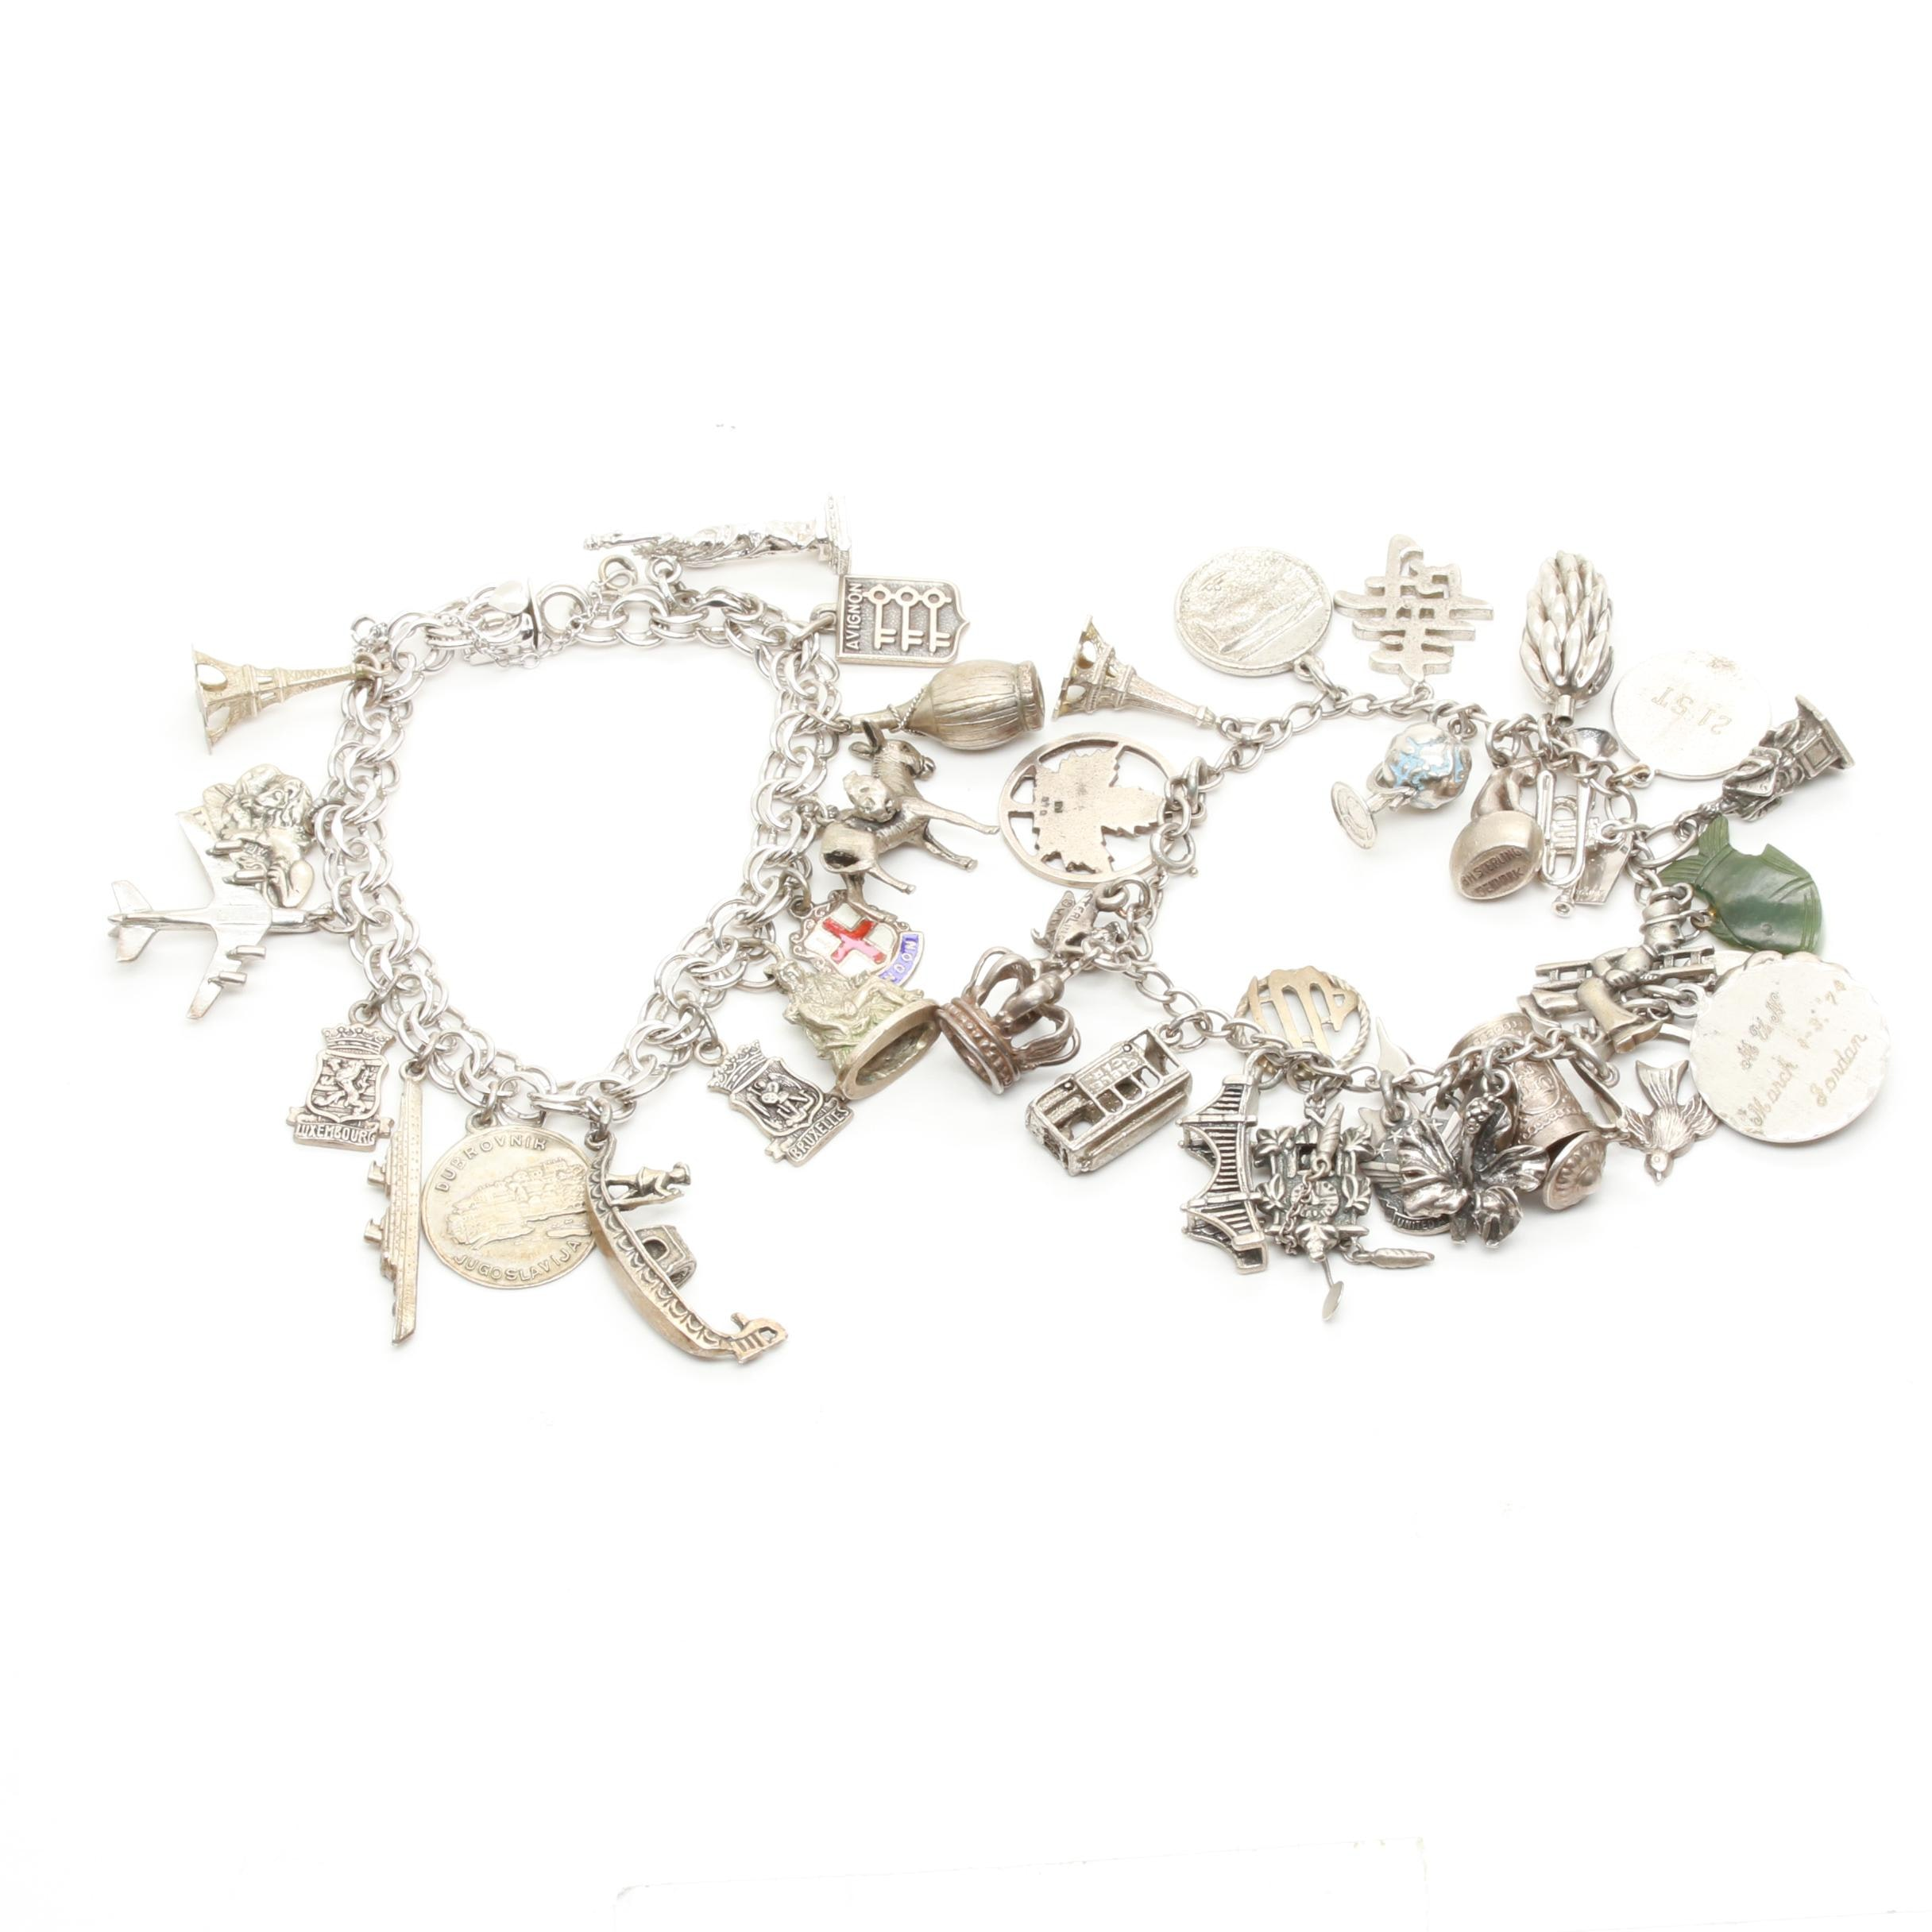 Sterling Silver Charm Bracelet Assortment including Nephrite and Enamel